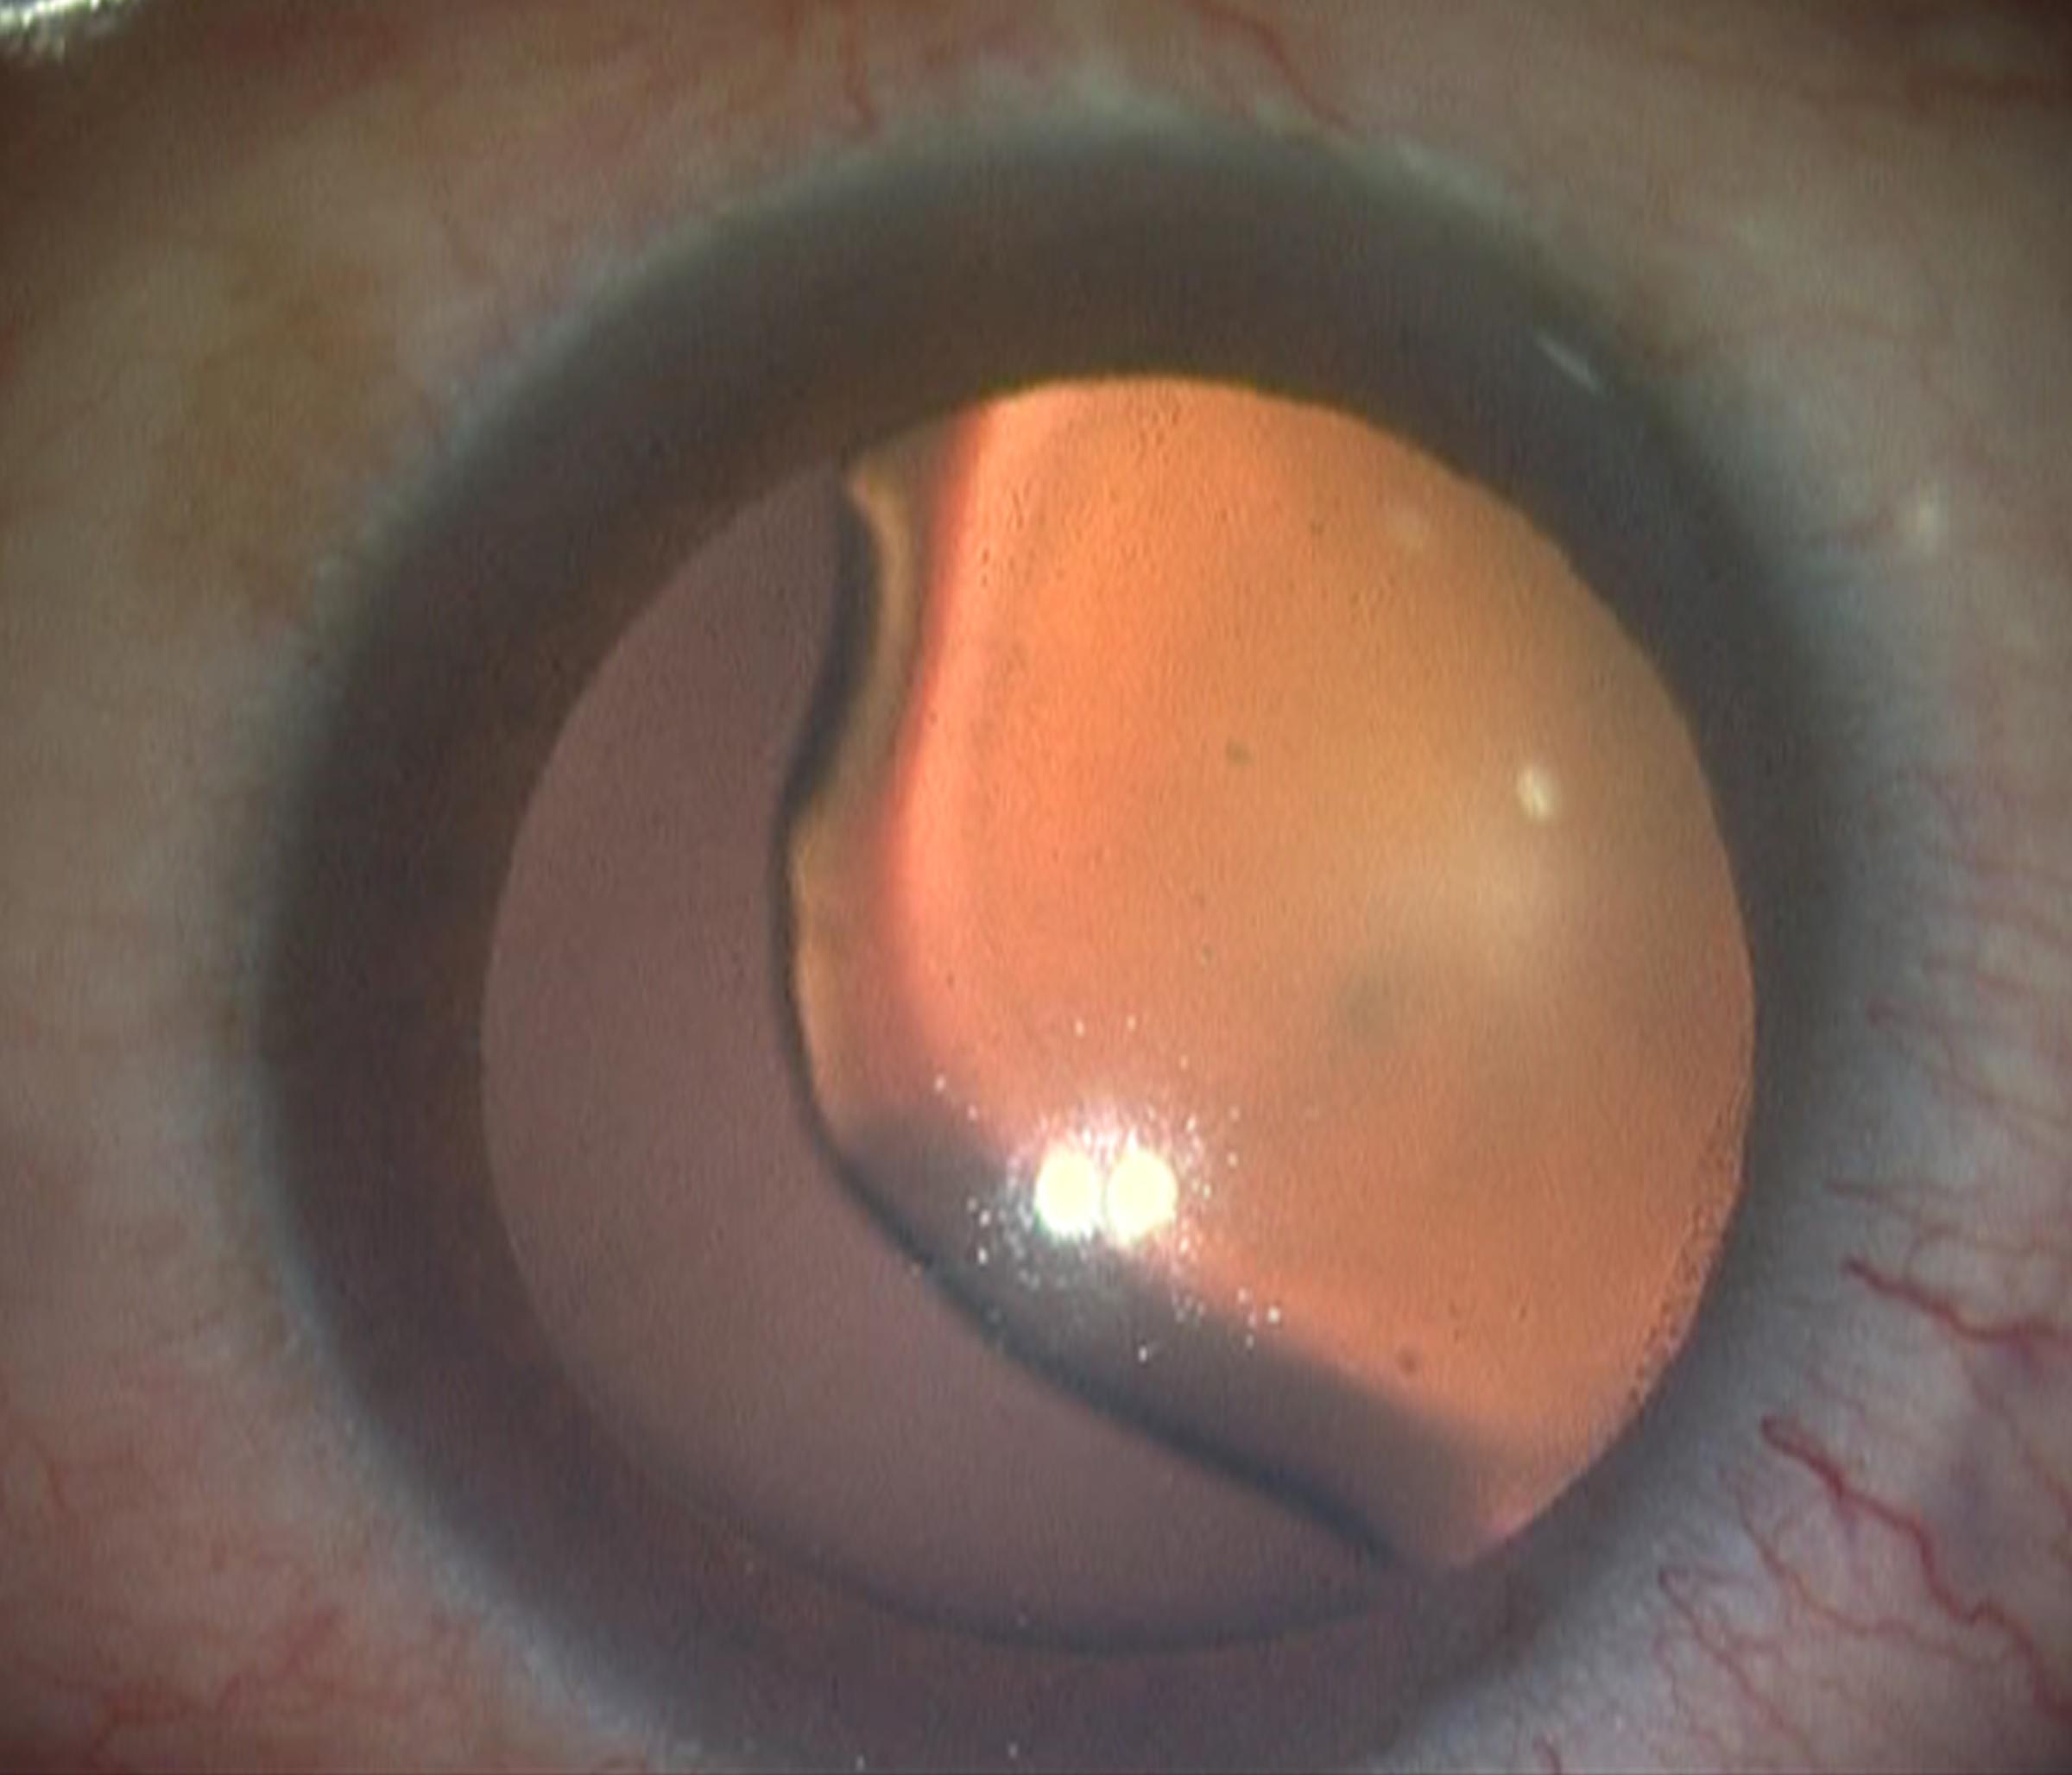 Intraocular Lens (IOLs)